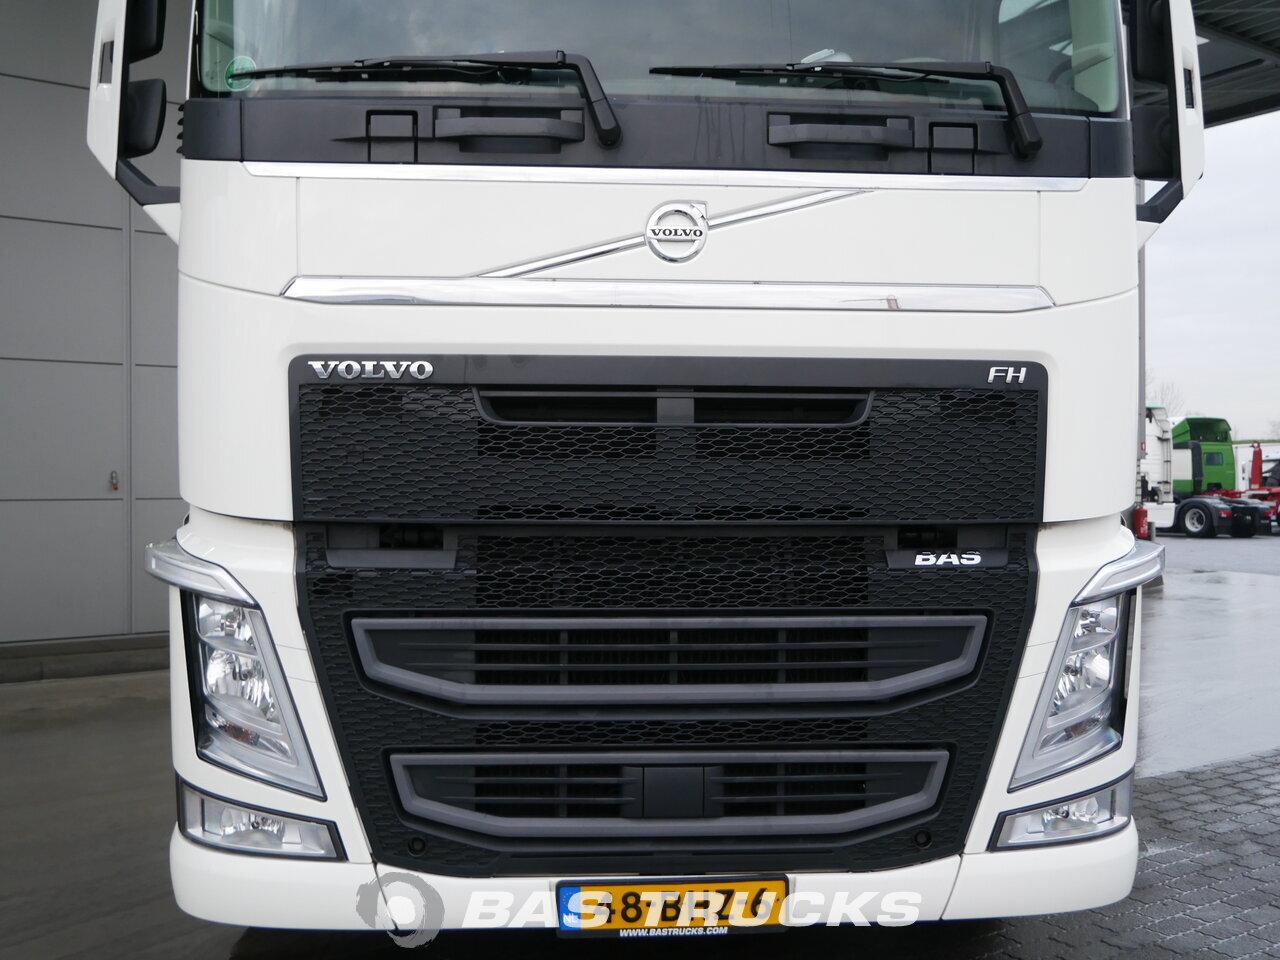 volvo fh 500 tractorhead euro norm 6 83200 bas trucks. Black Bedroom Furniture Sets. Home Design Ideas